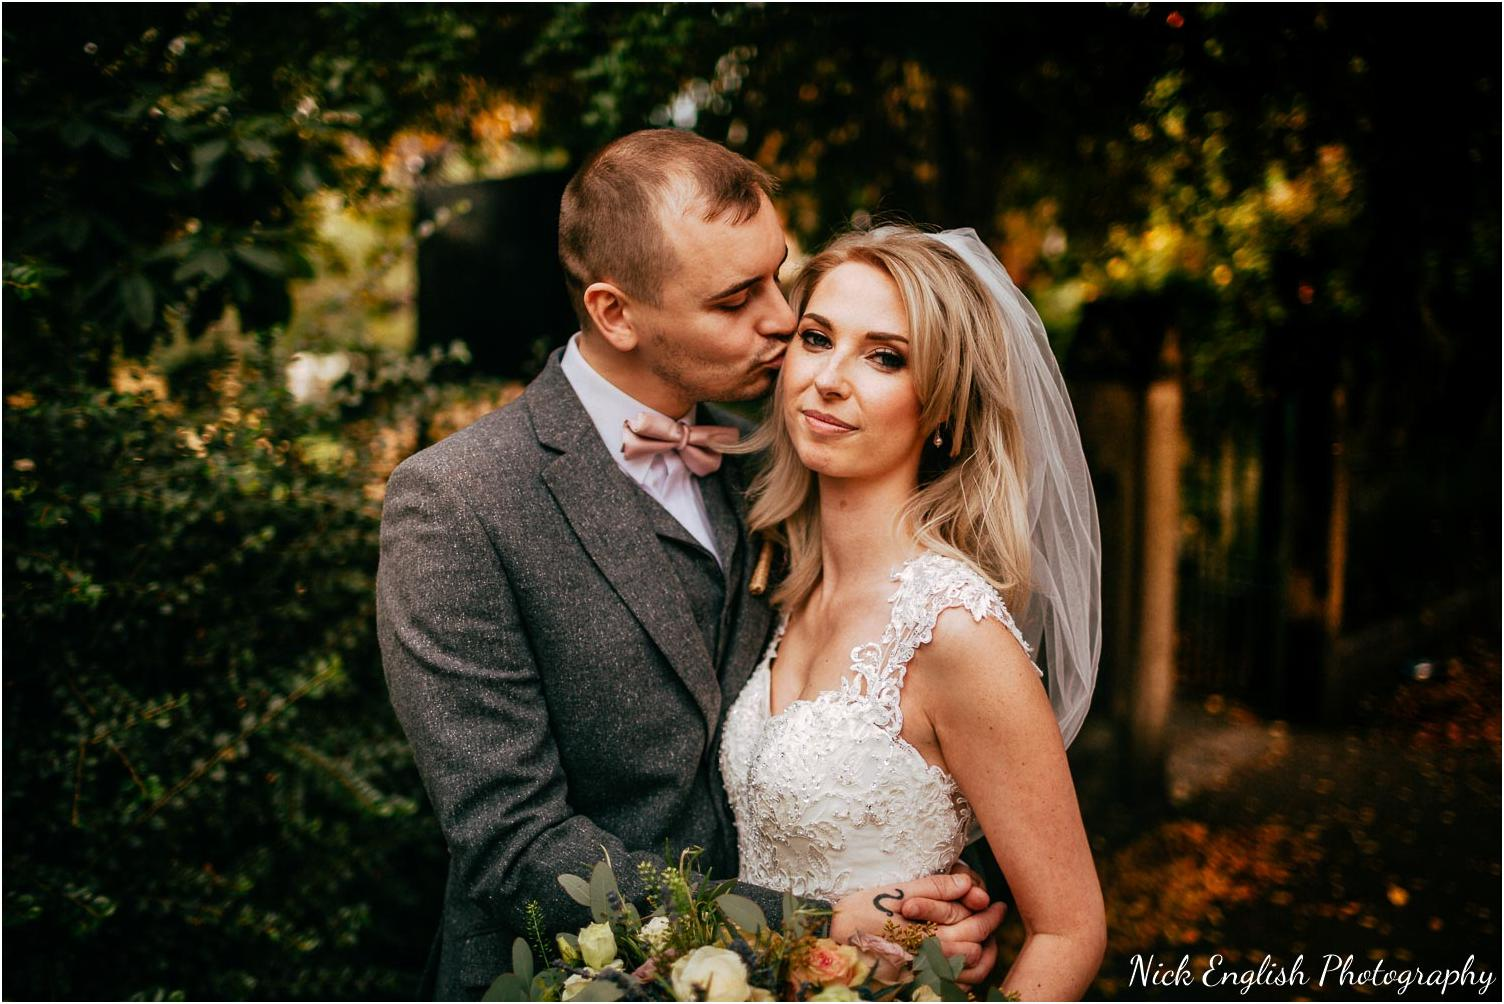 Lancashire_Wedding_Photographer-1-14.jpg